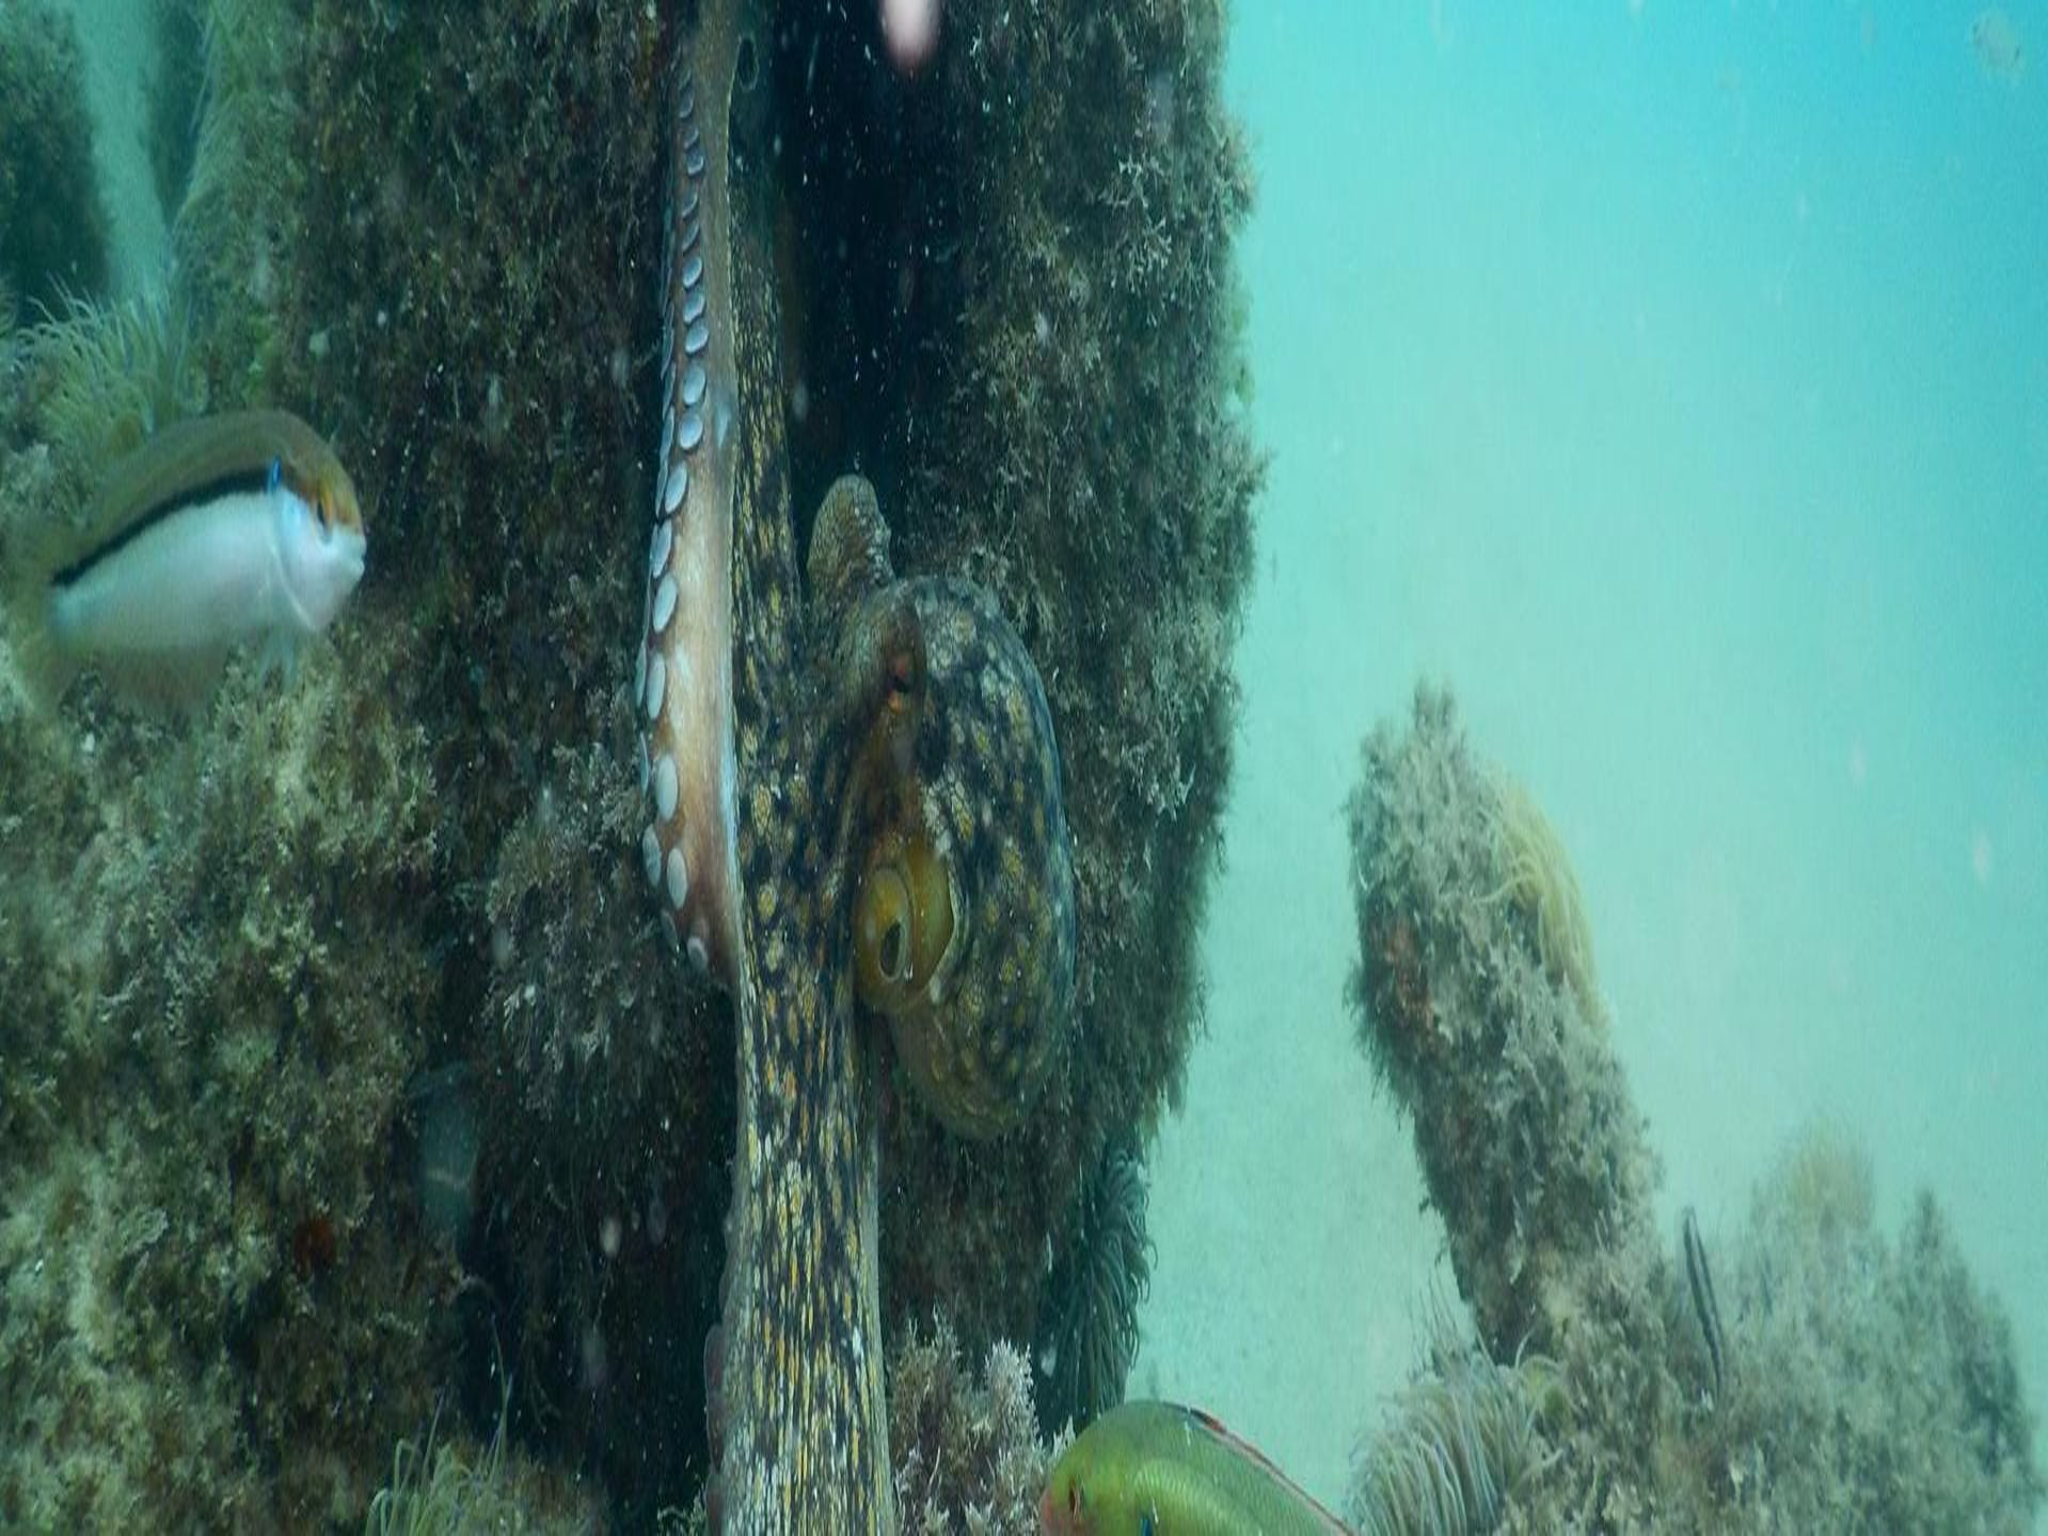 Scuba Diving Course - PADI Divemaster